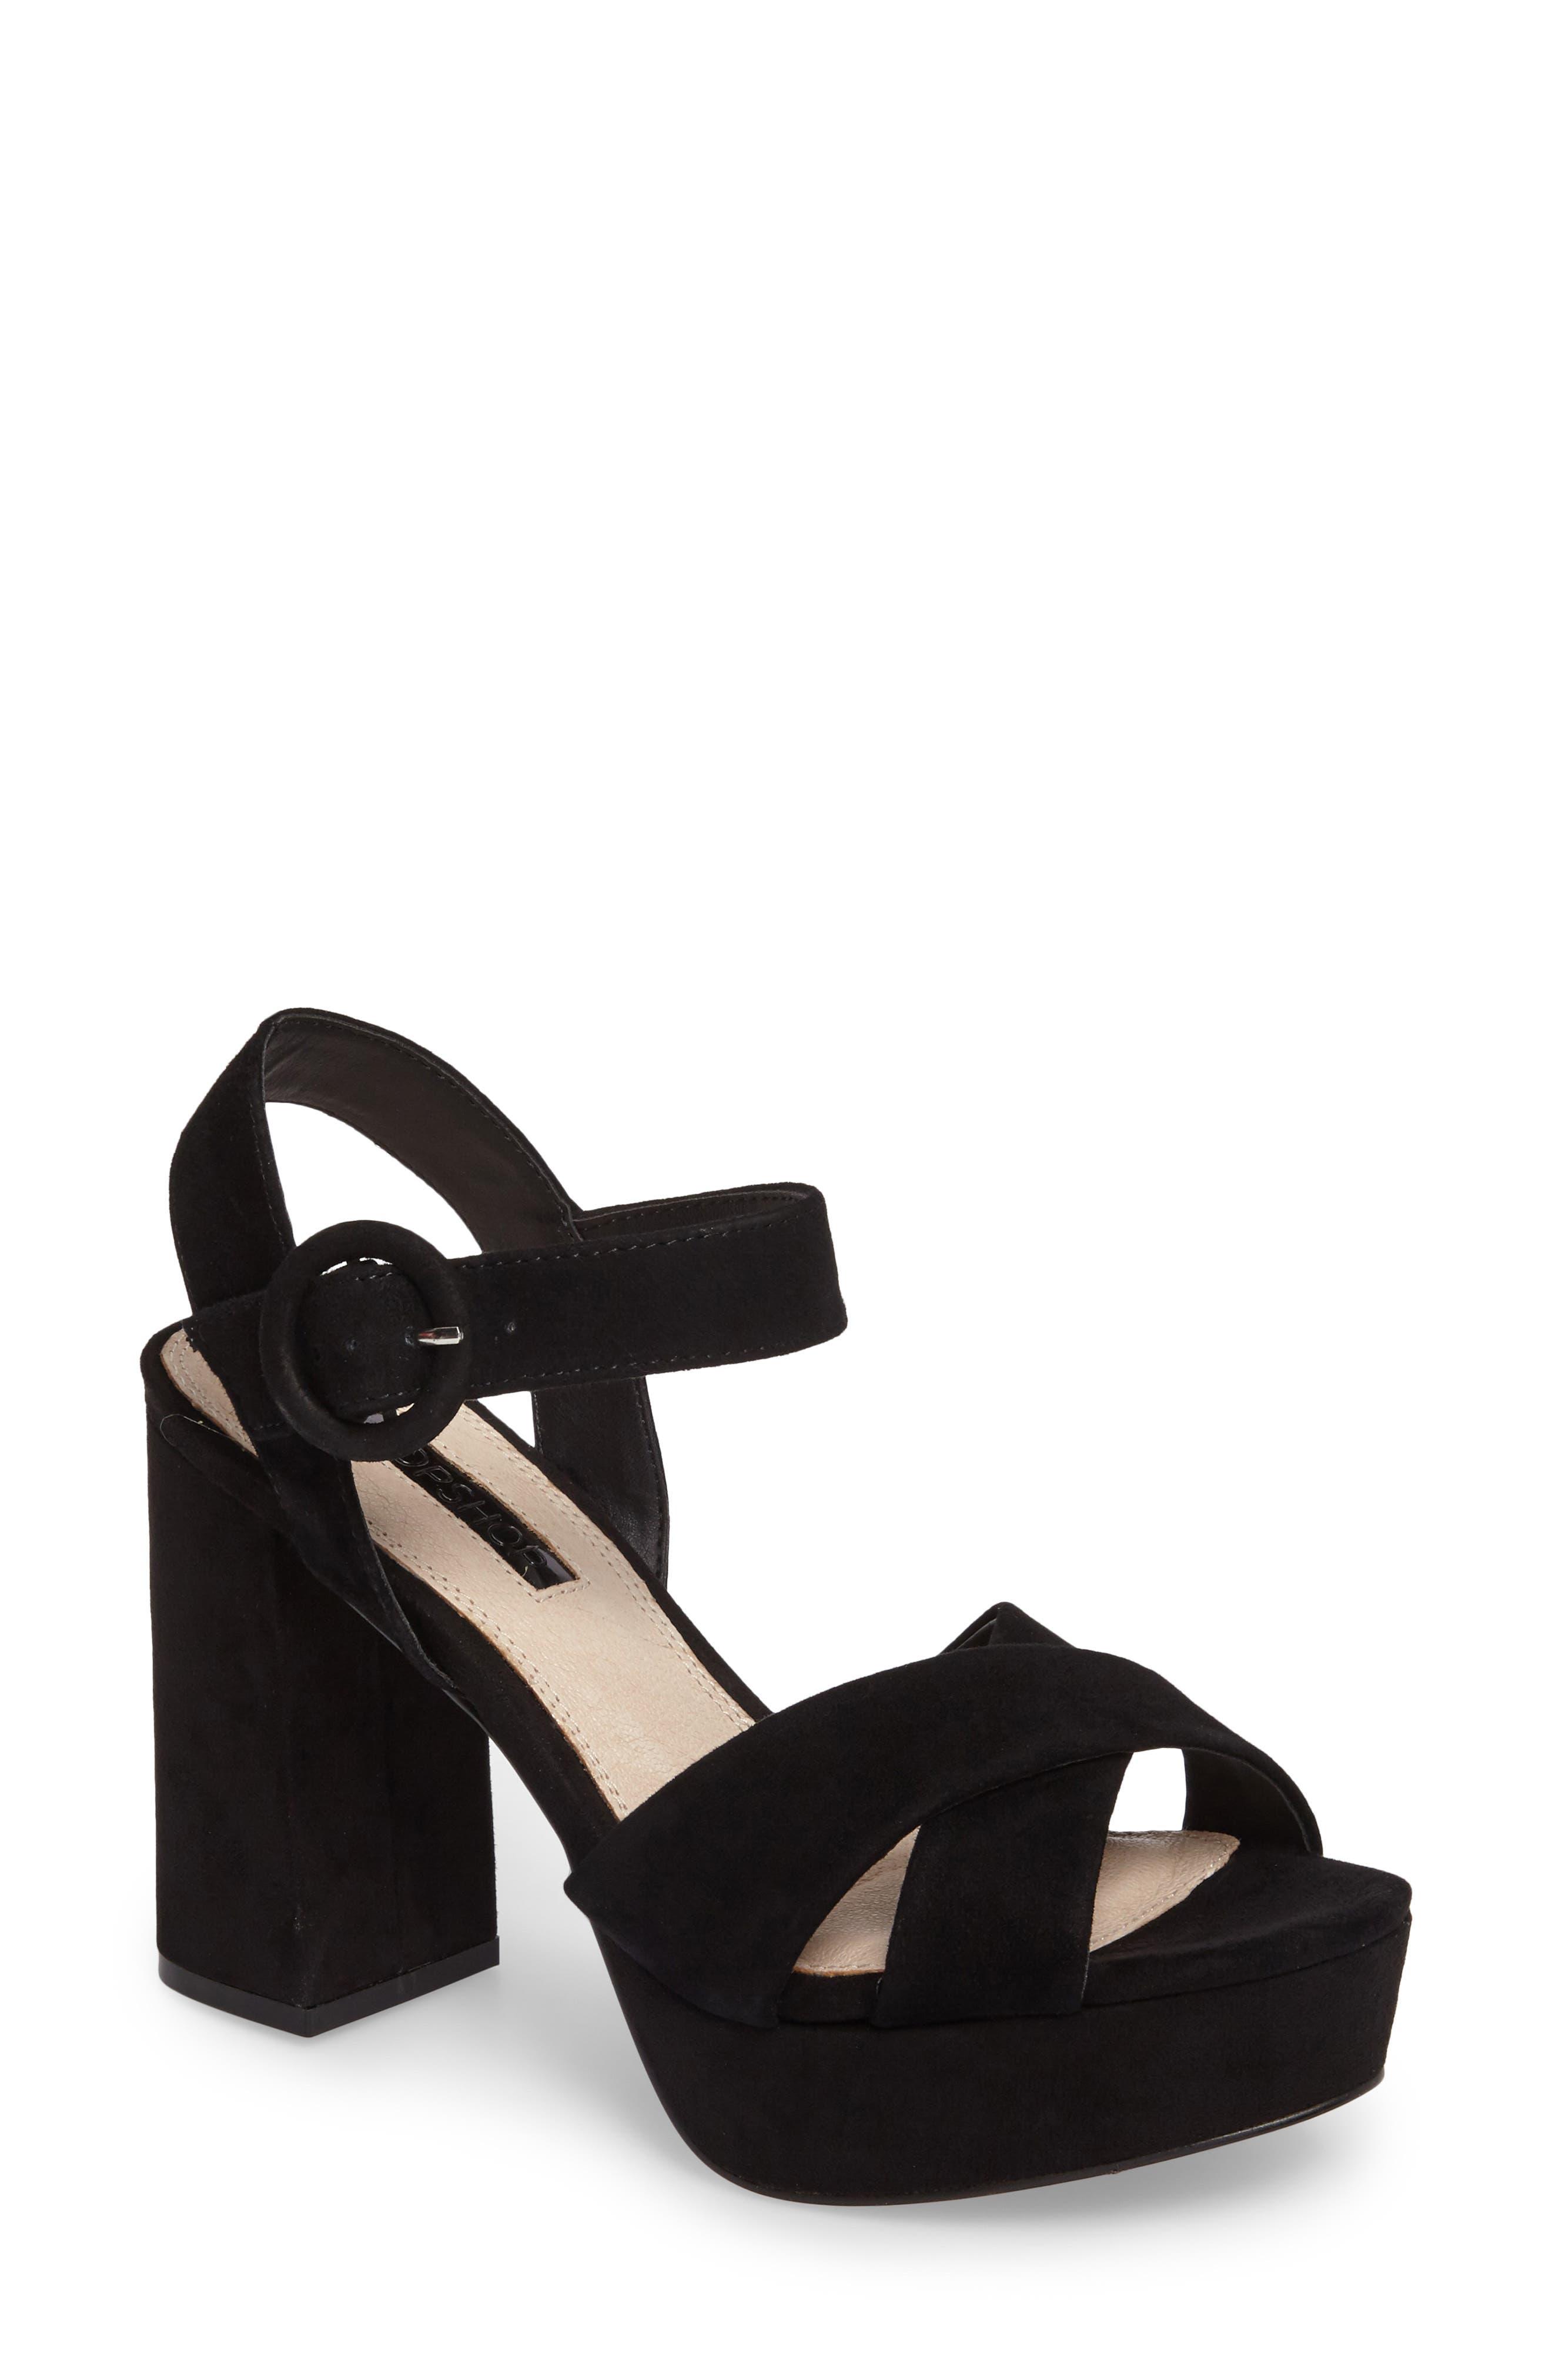 Alternate Image 1 Selected - Topshop Cross Strap Platform Sandal (Women)